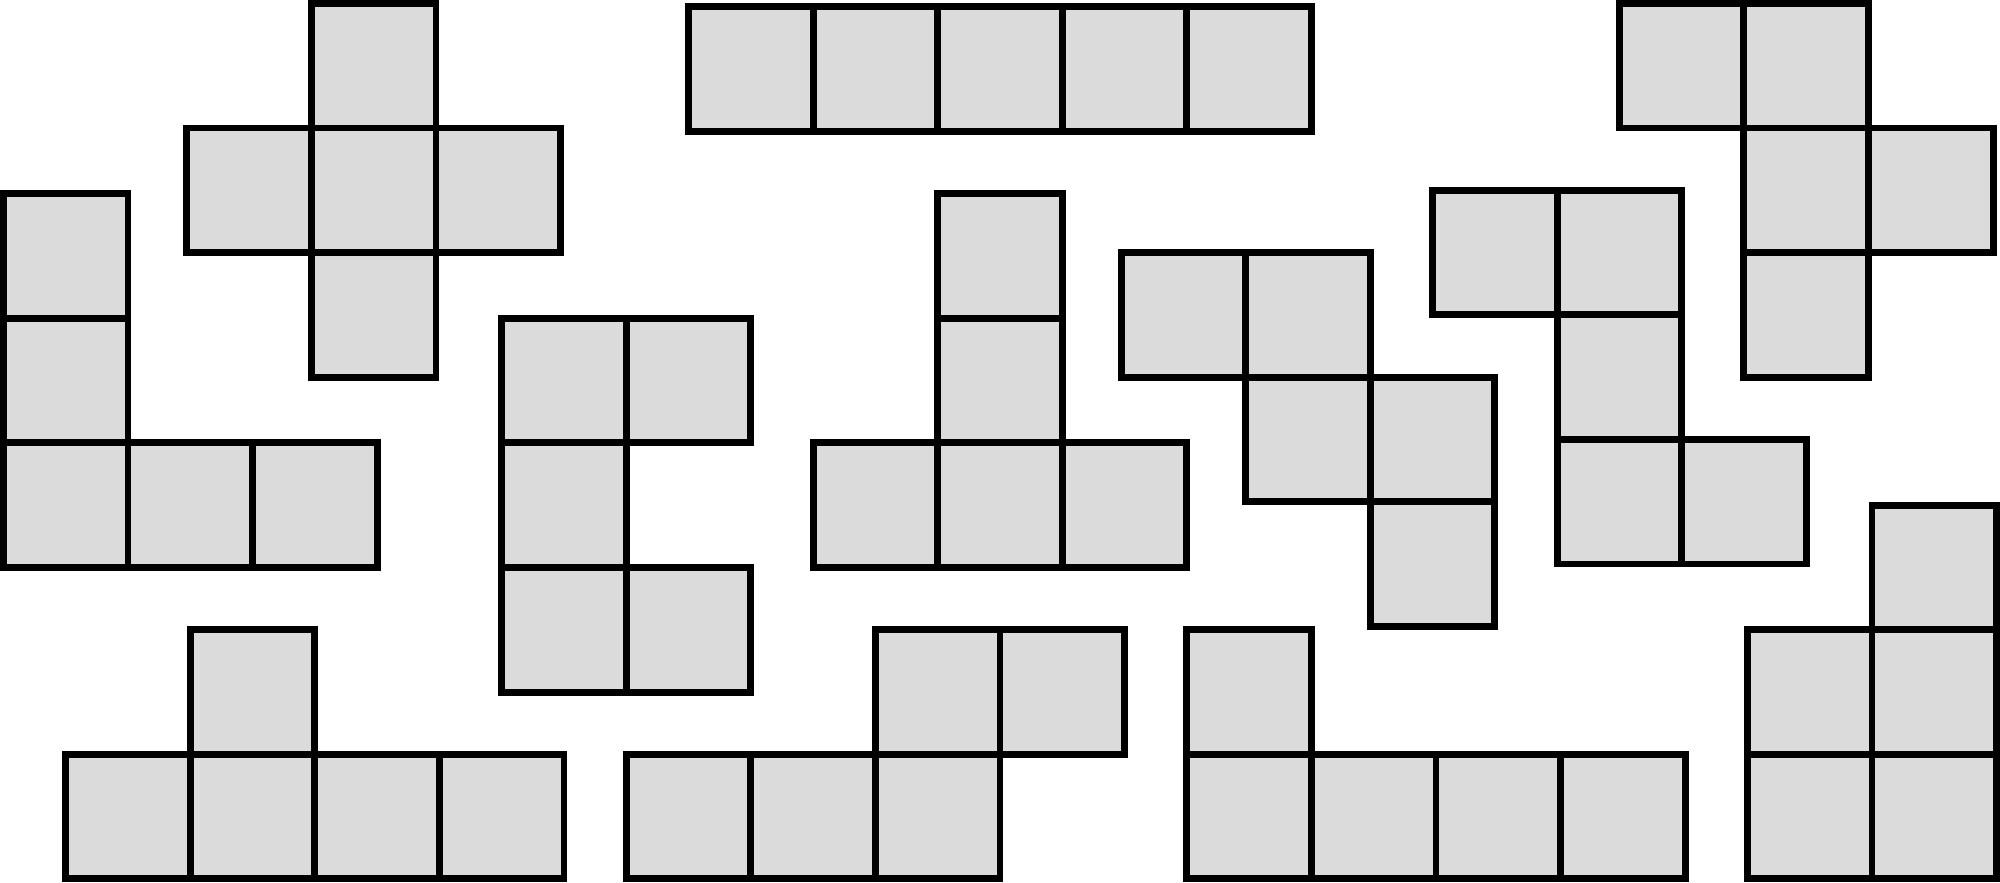 u0026quot pentominoes  a k a polyominoes  u0026quot